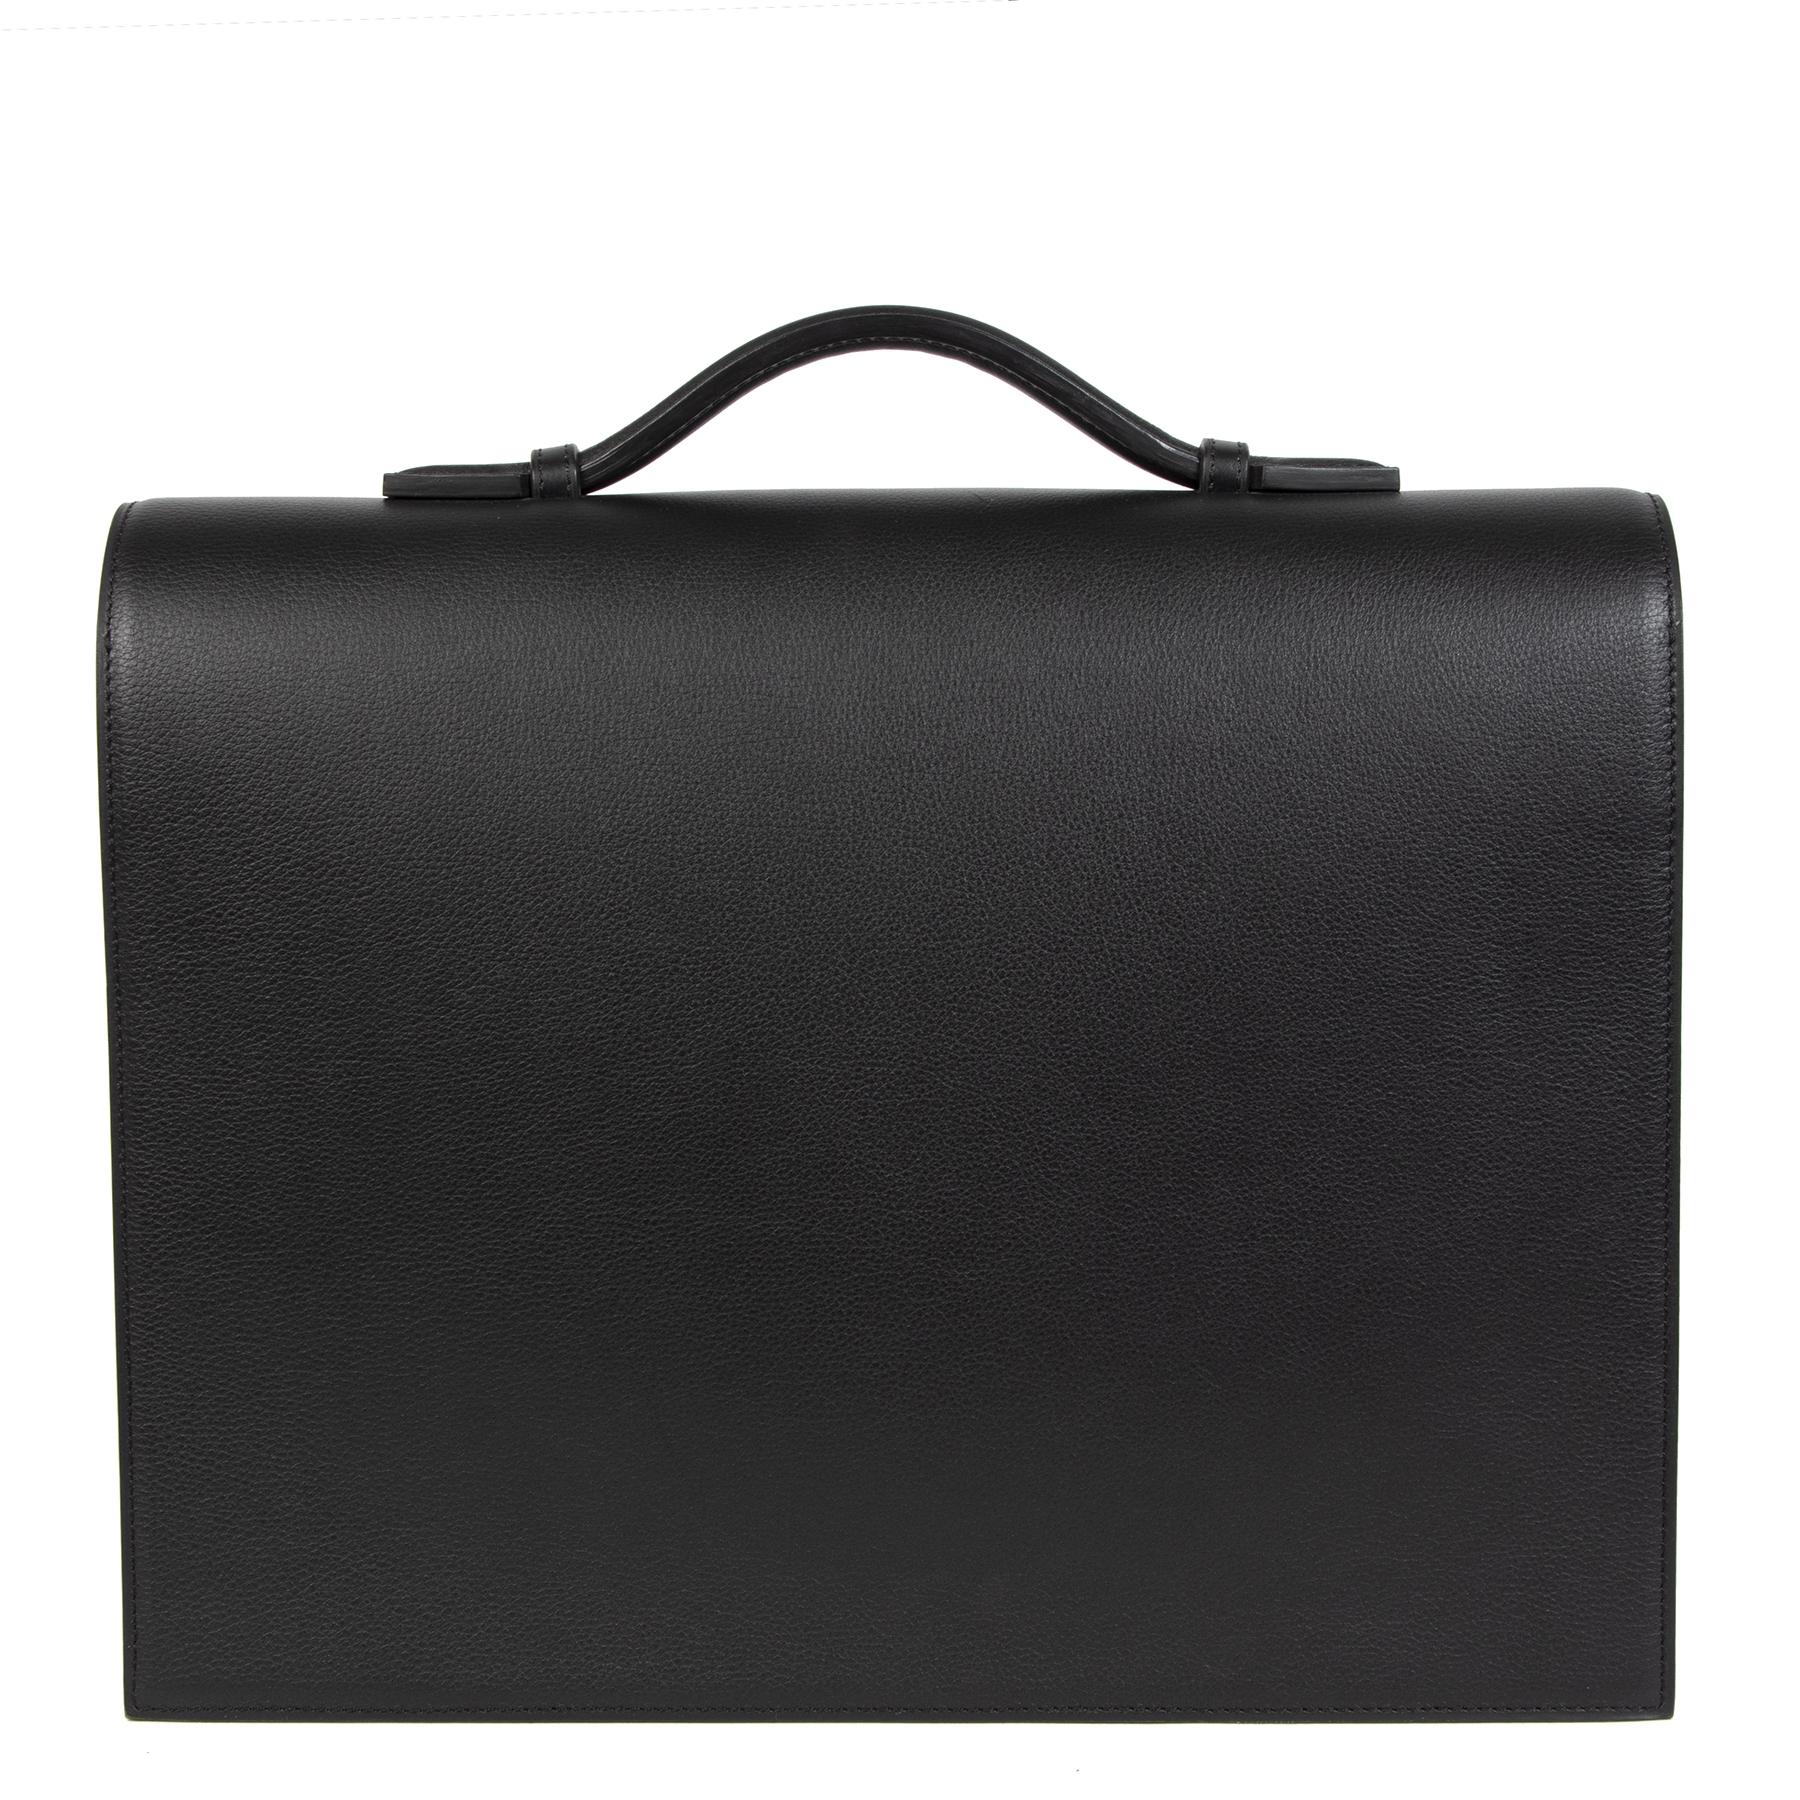 Authentieke tweedehands vintage Delvaux Black Briefcase koop online webshop LabelLOV